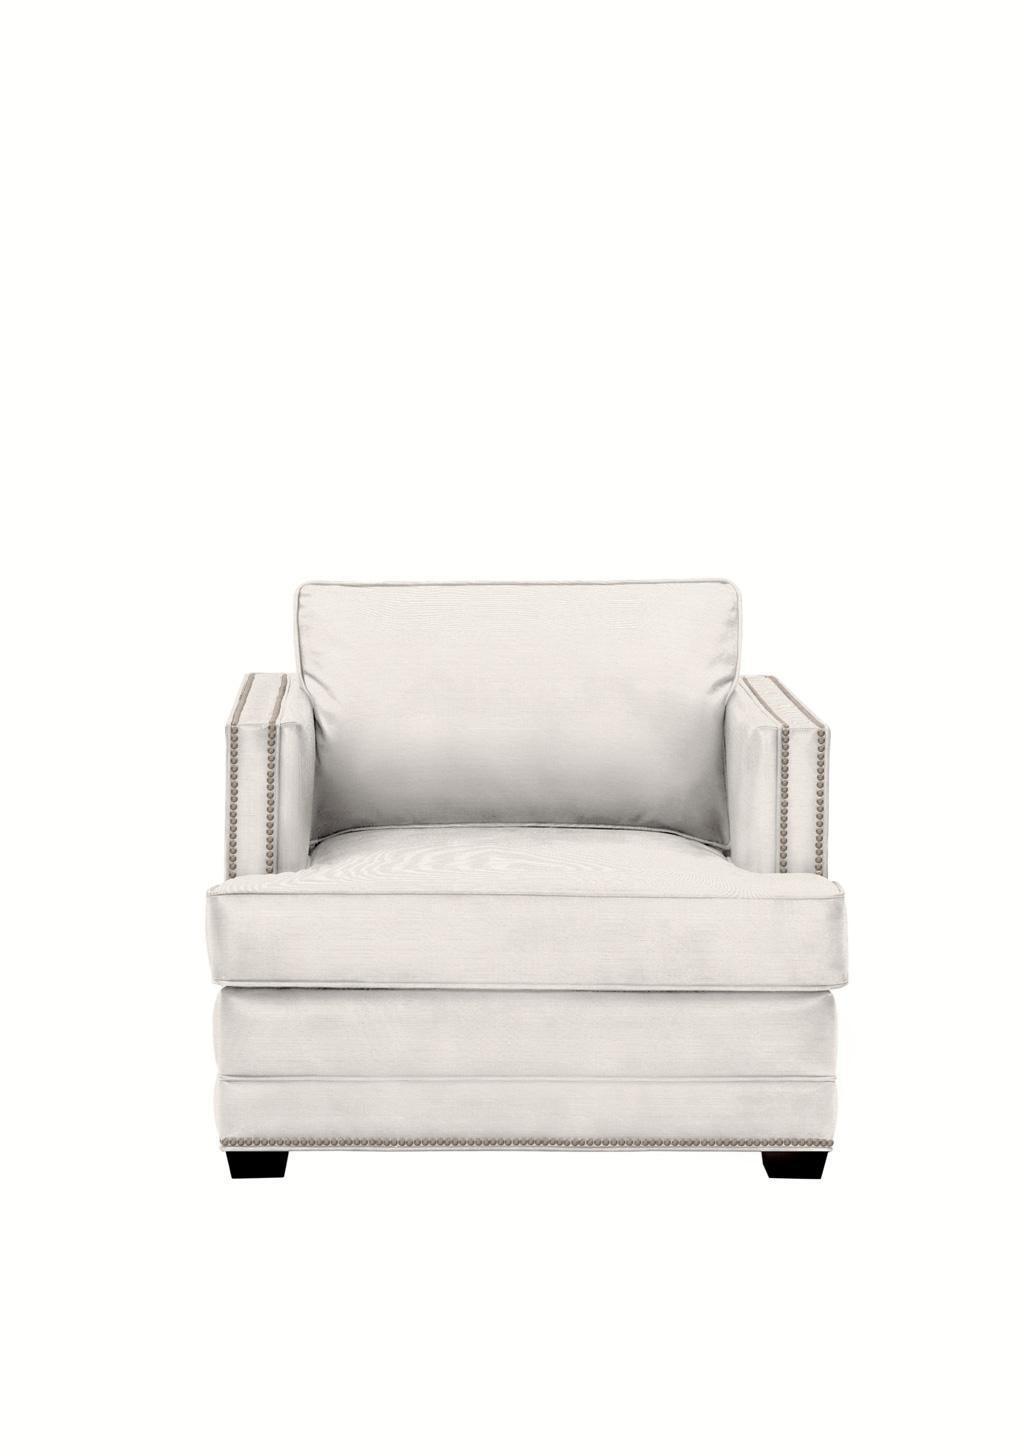 Harbor House DAKOTA单人沙发10186505041018650504